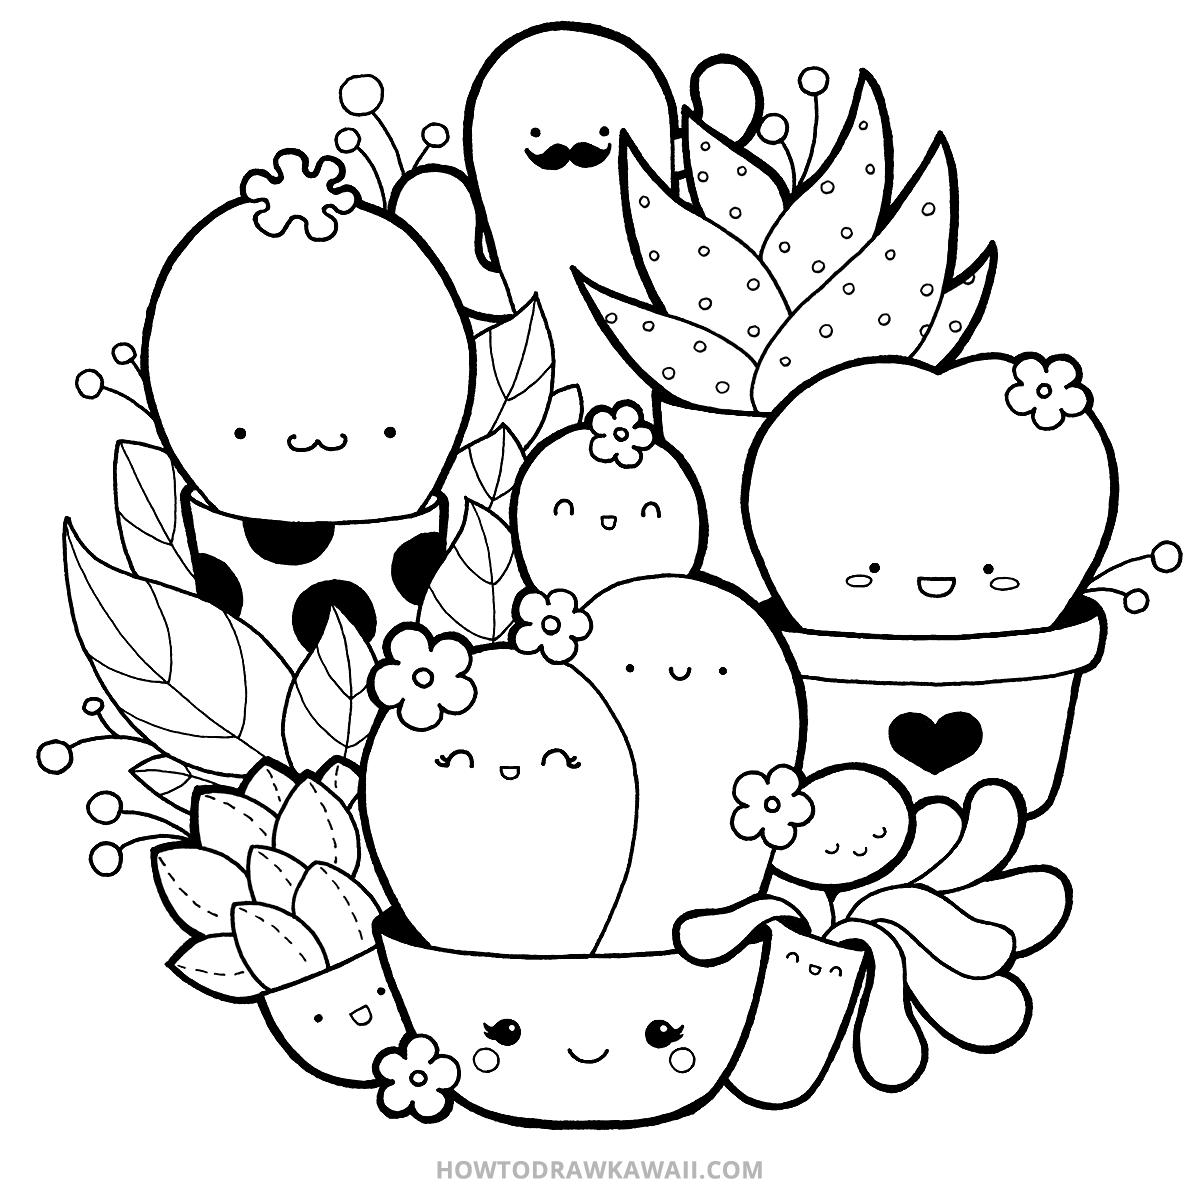 How To Draw Kawaii Succulents Kawaii Doodle Step By Step